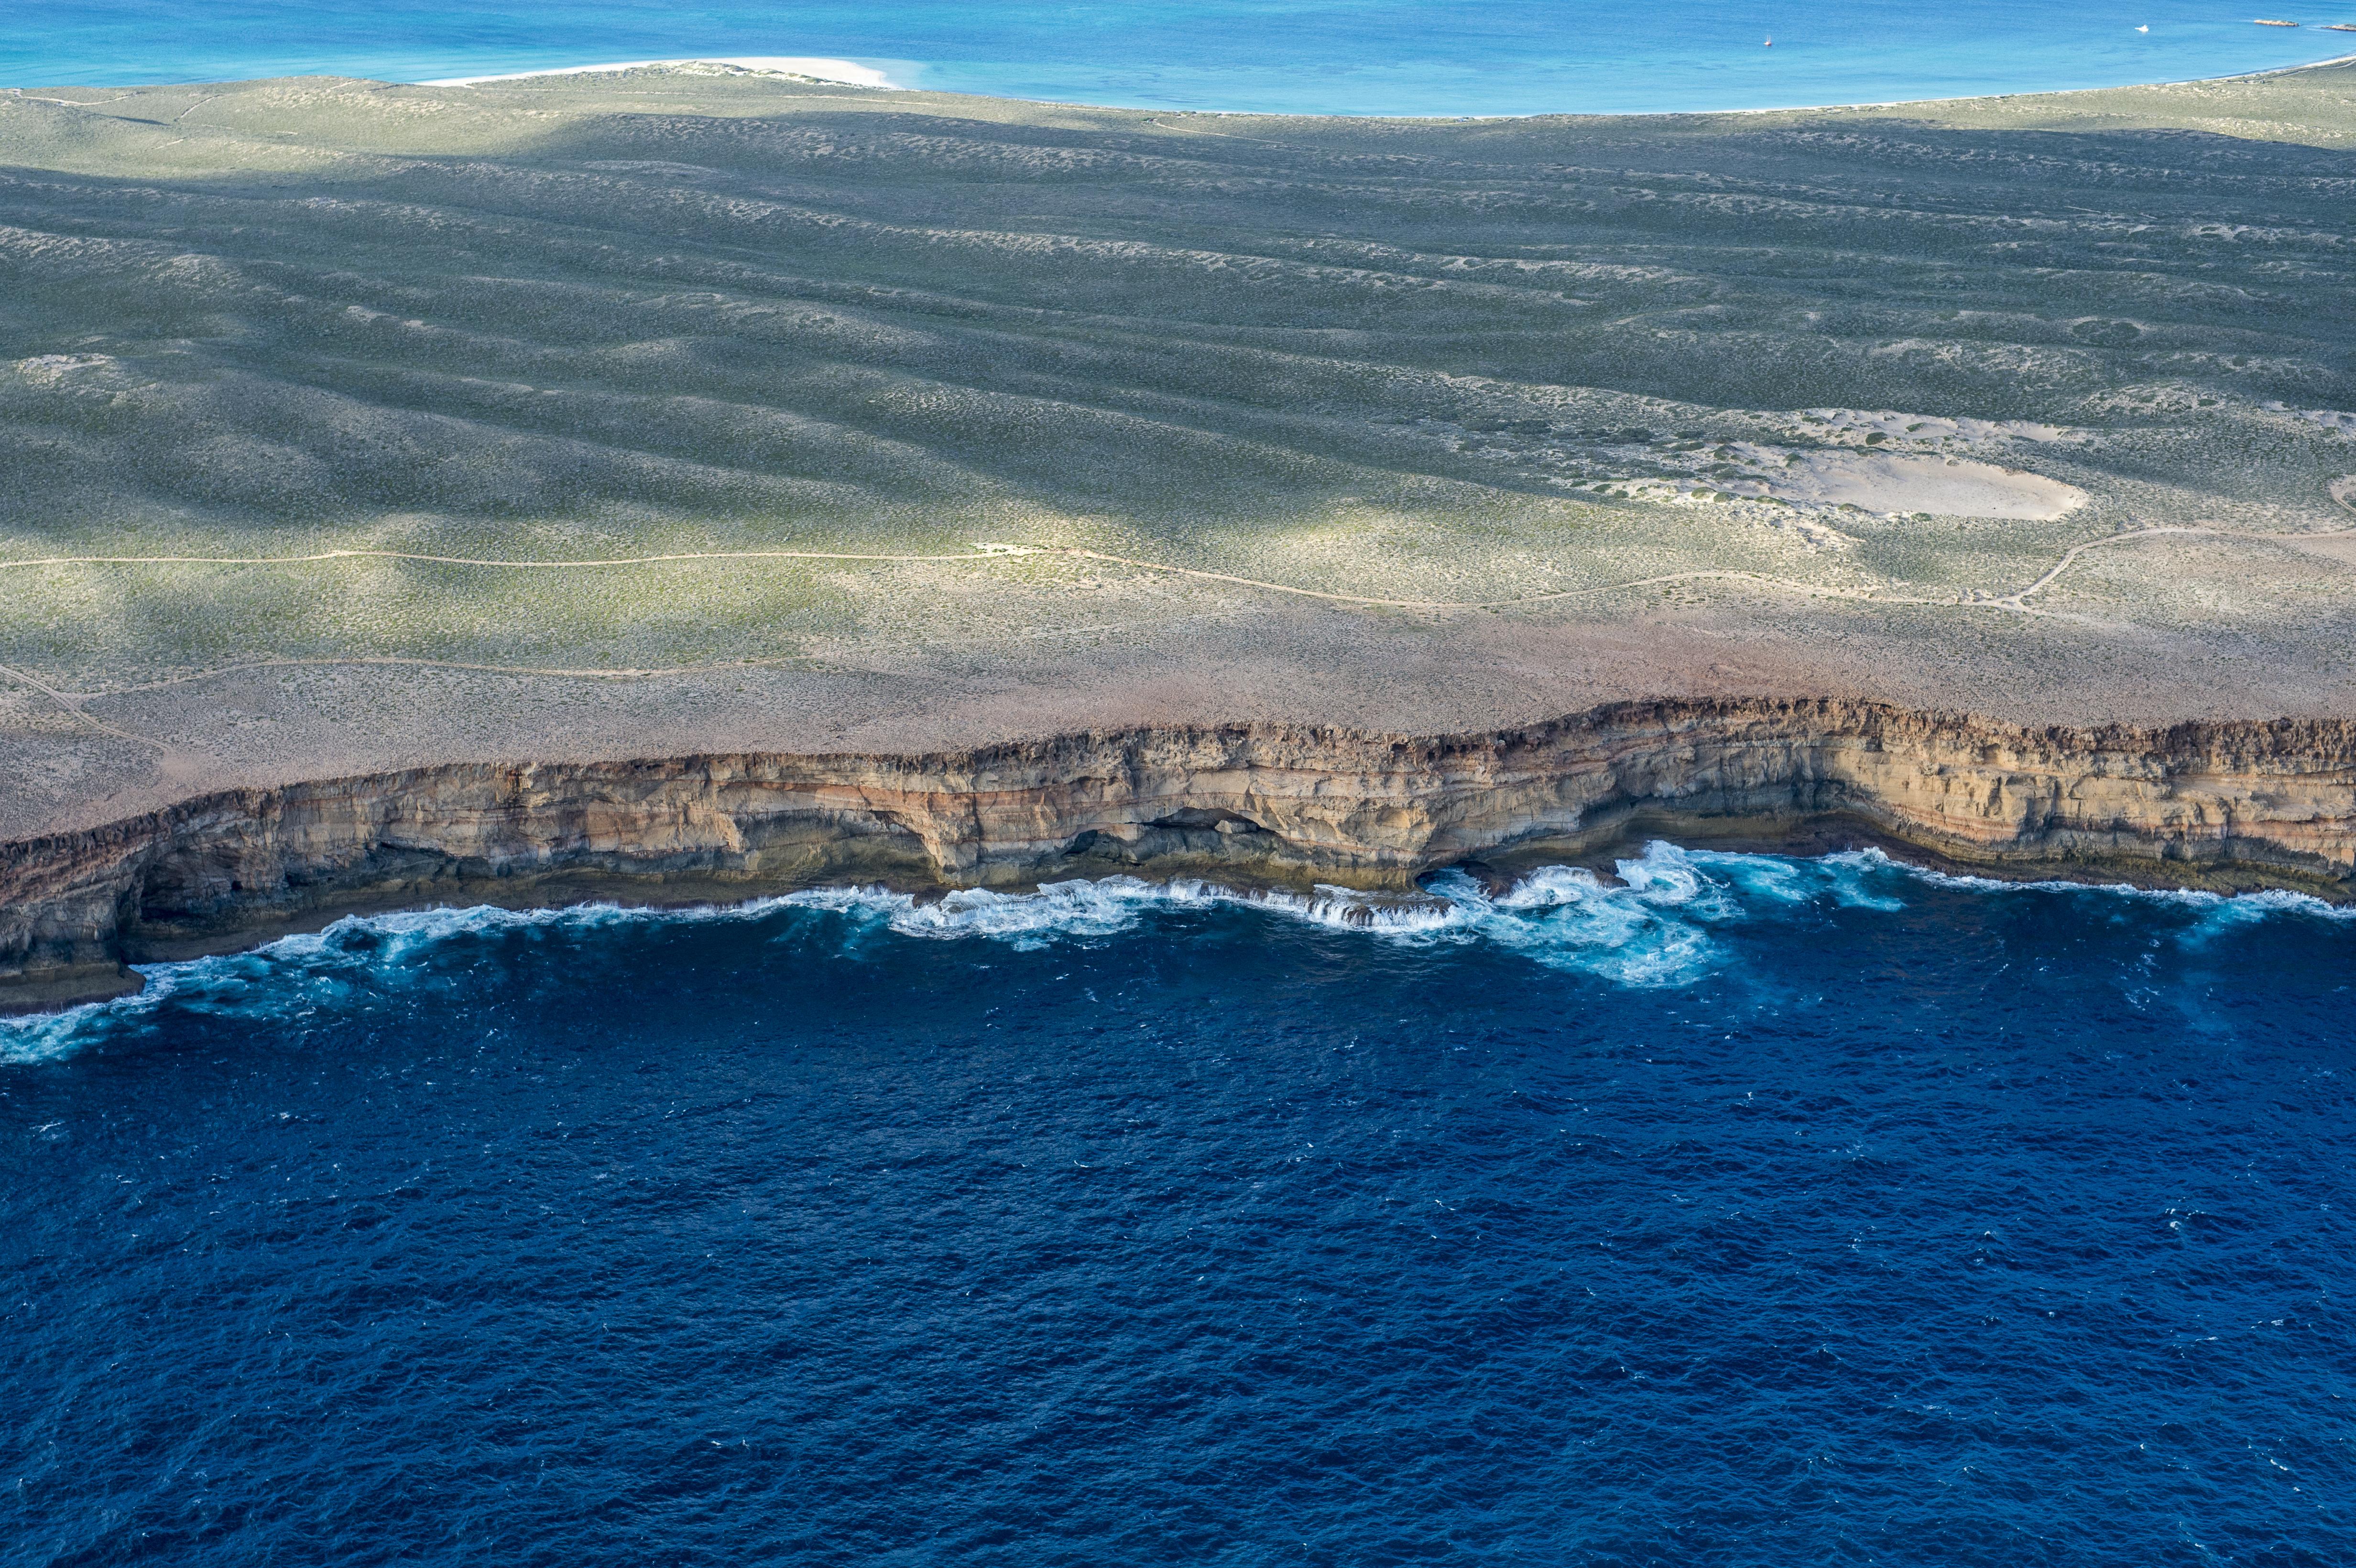 Coastal Cliffs